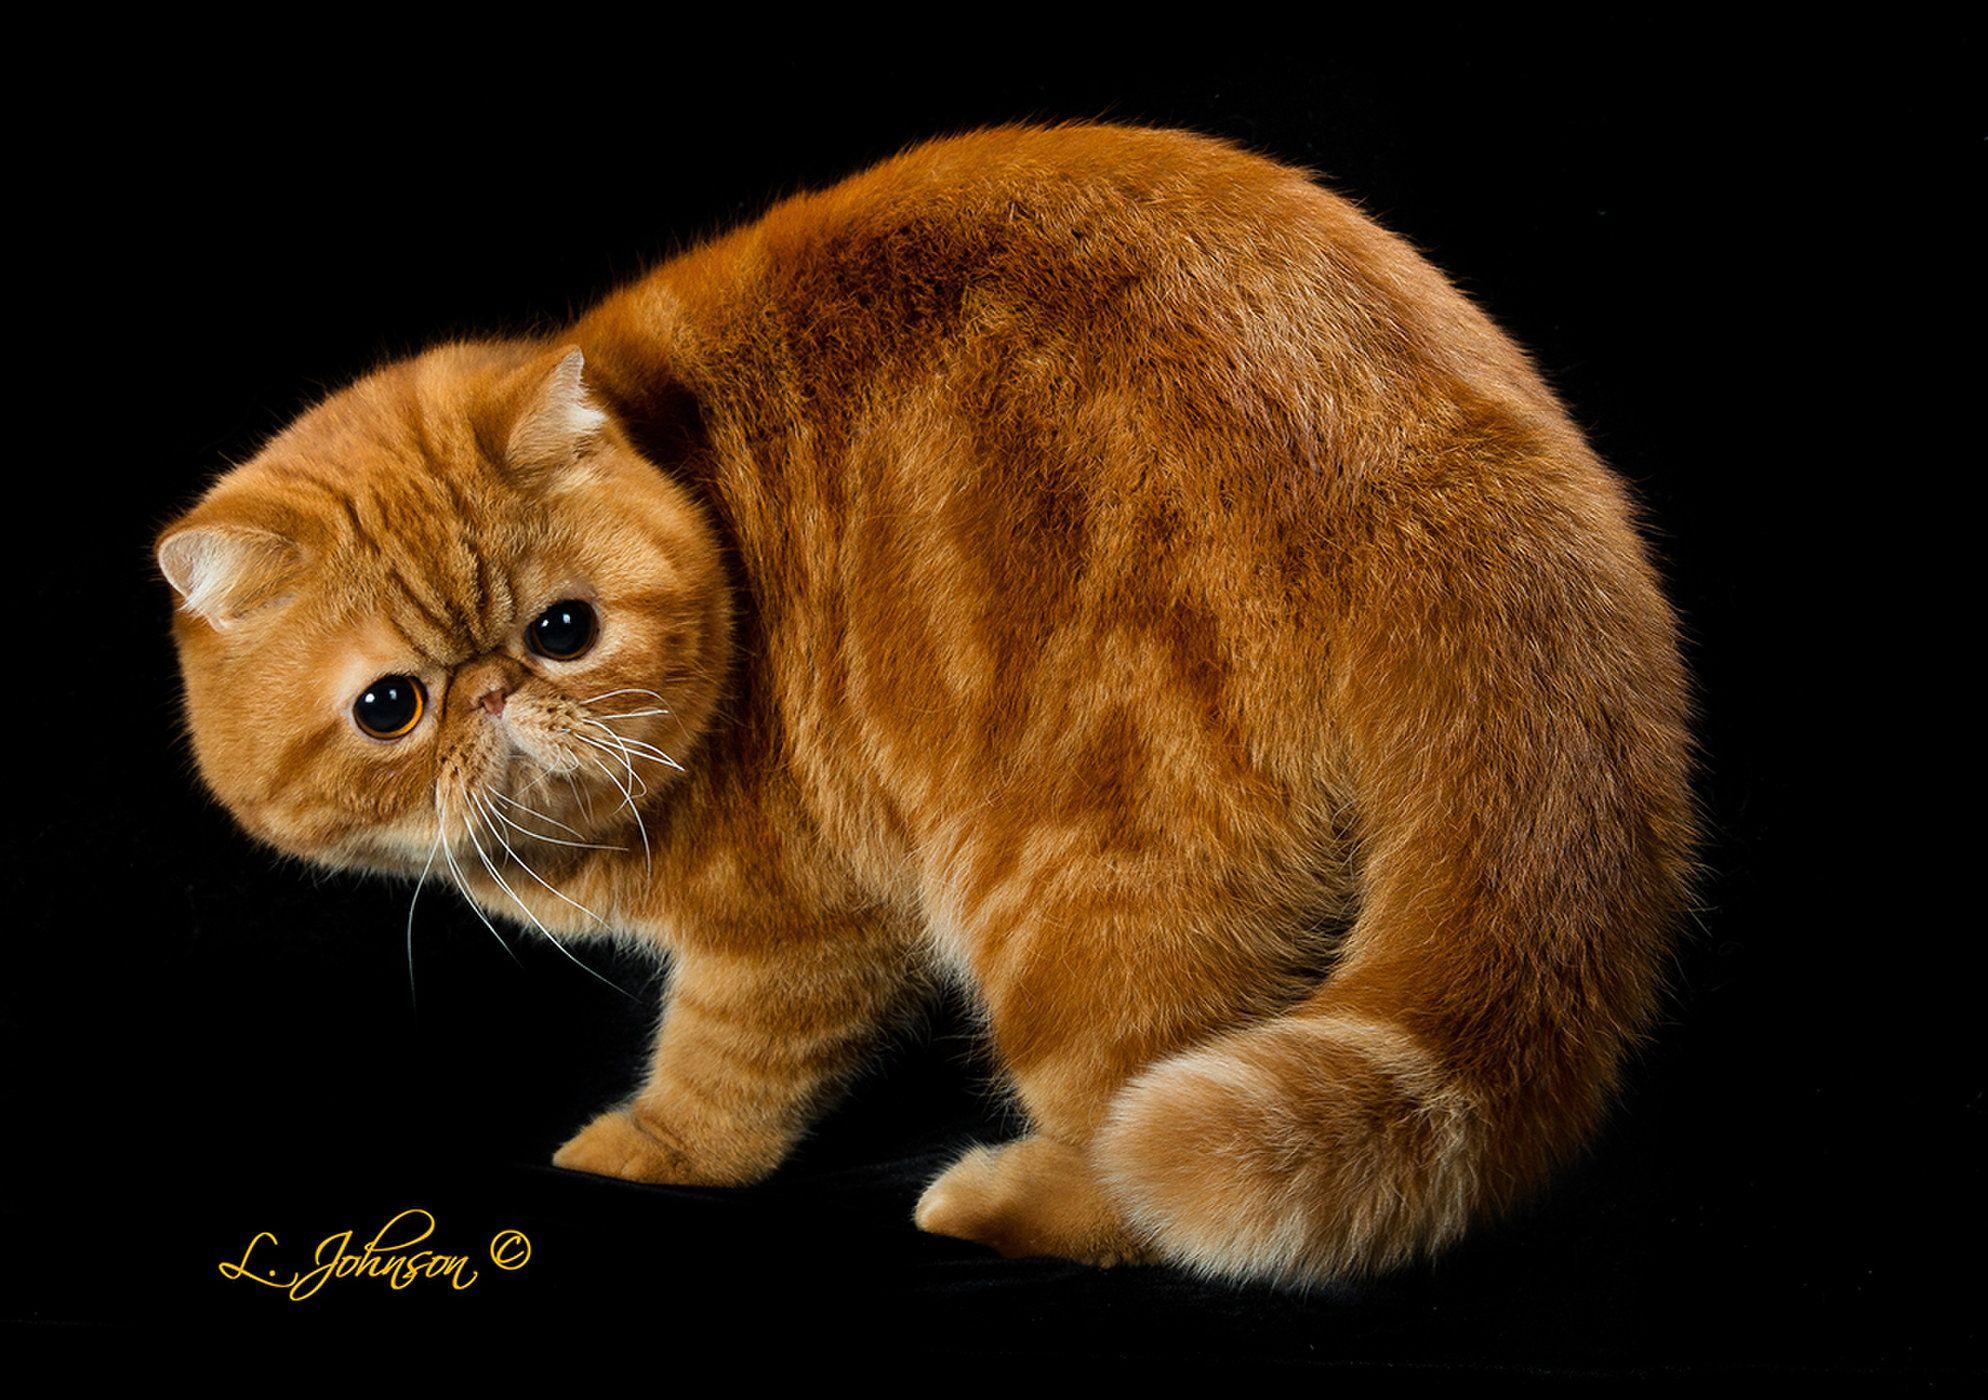 CFA's Best Cat, International Winning the titles of Best